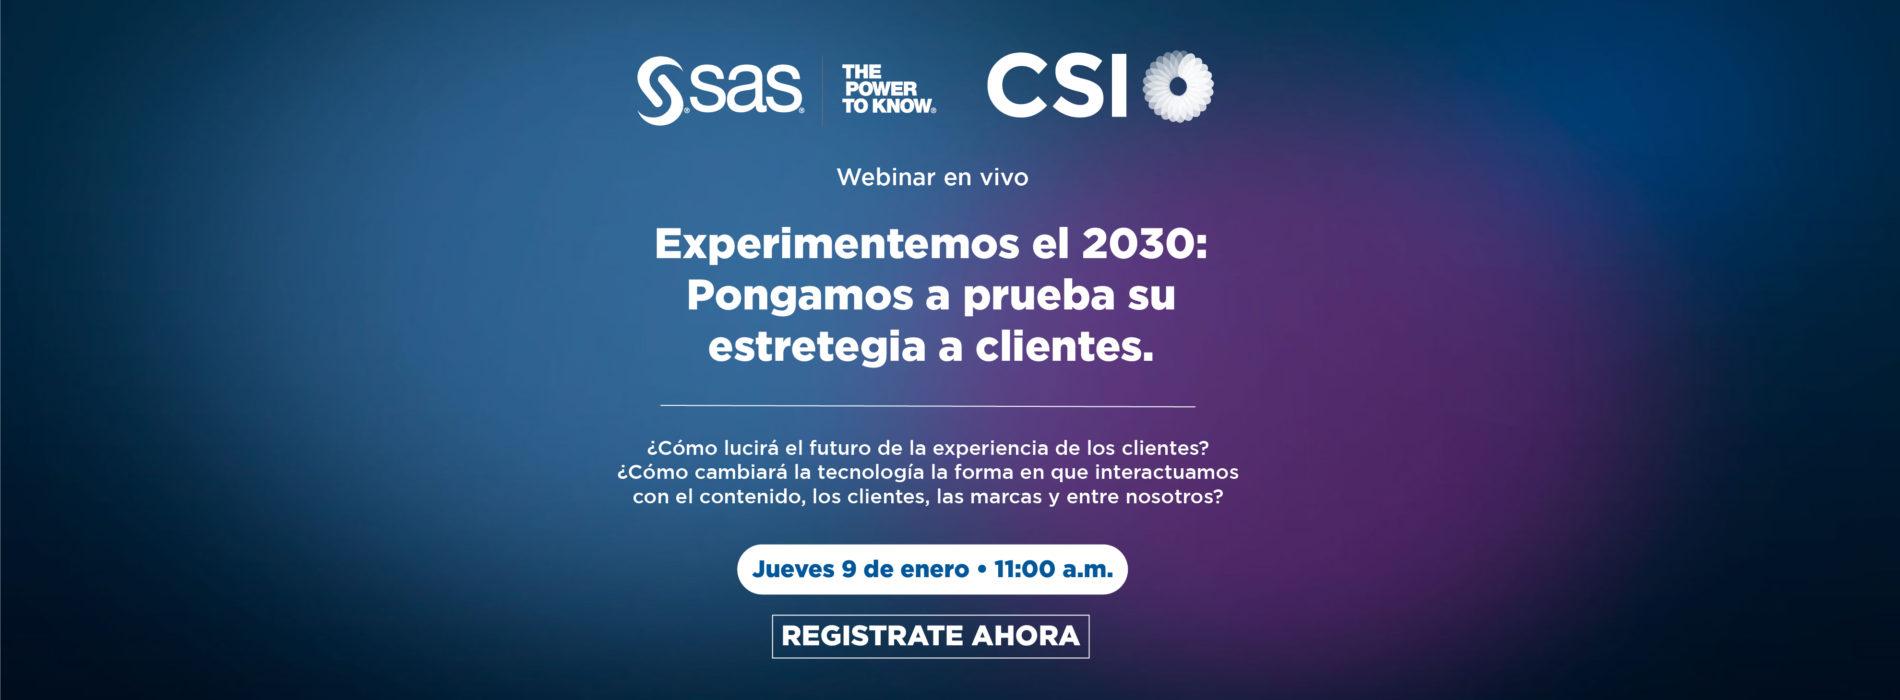 SAS Webinar